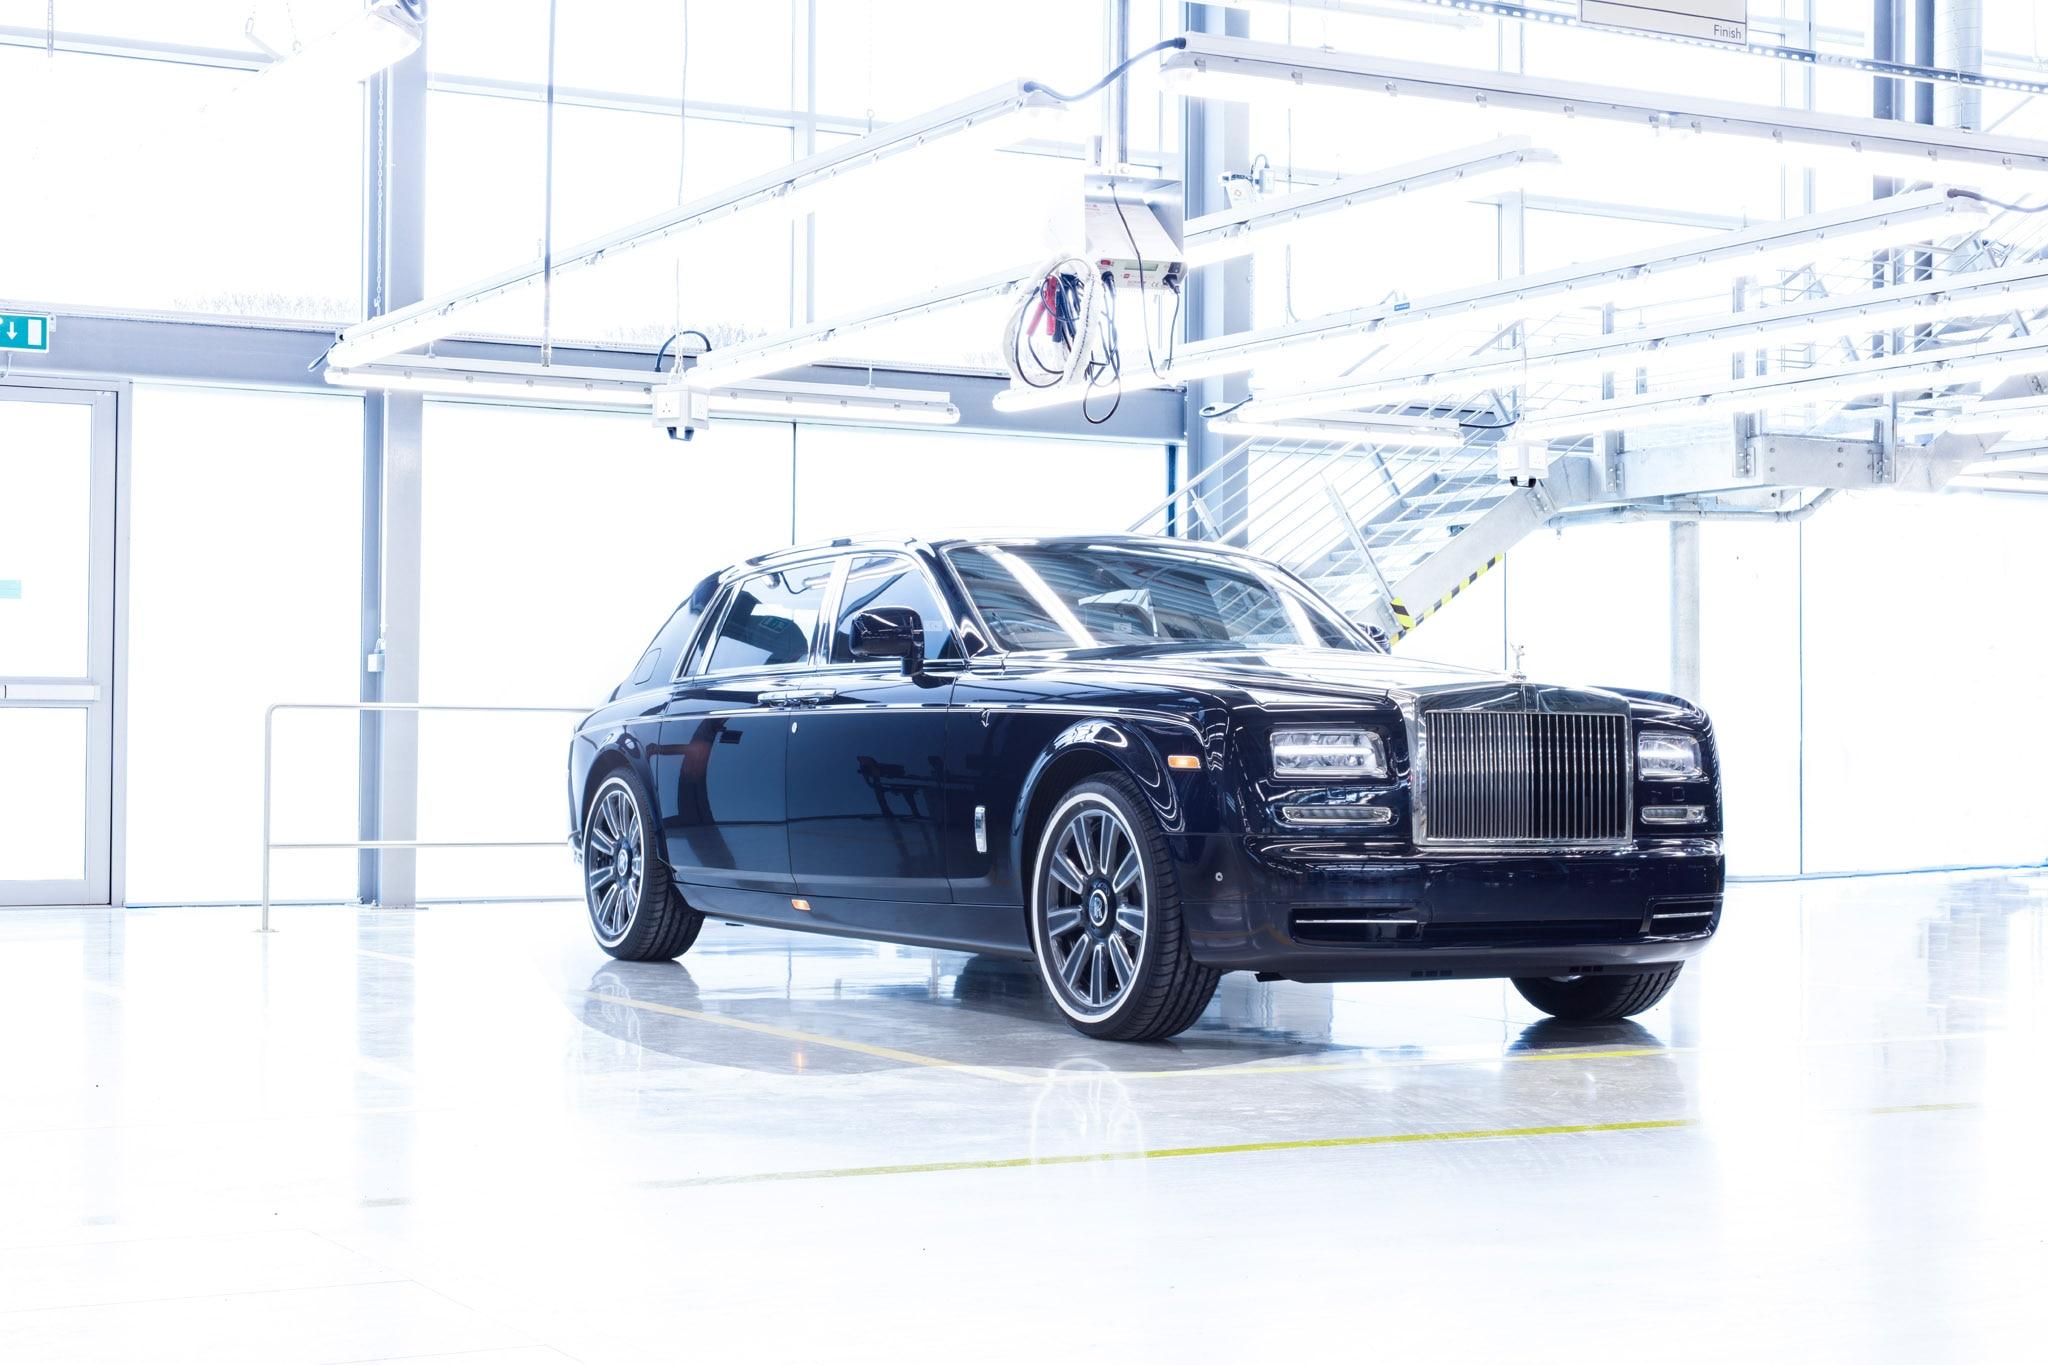 Final Rolls Royce Phantom VII